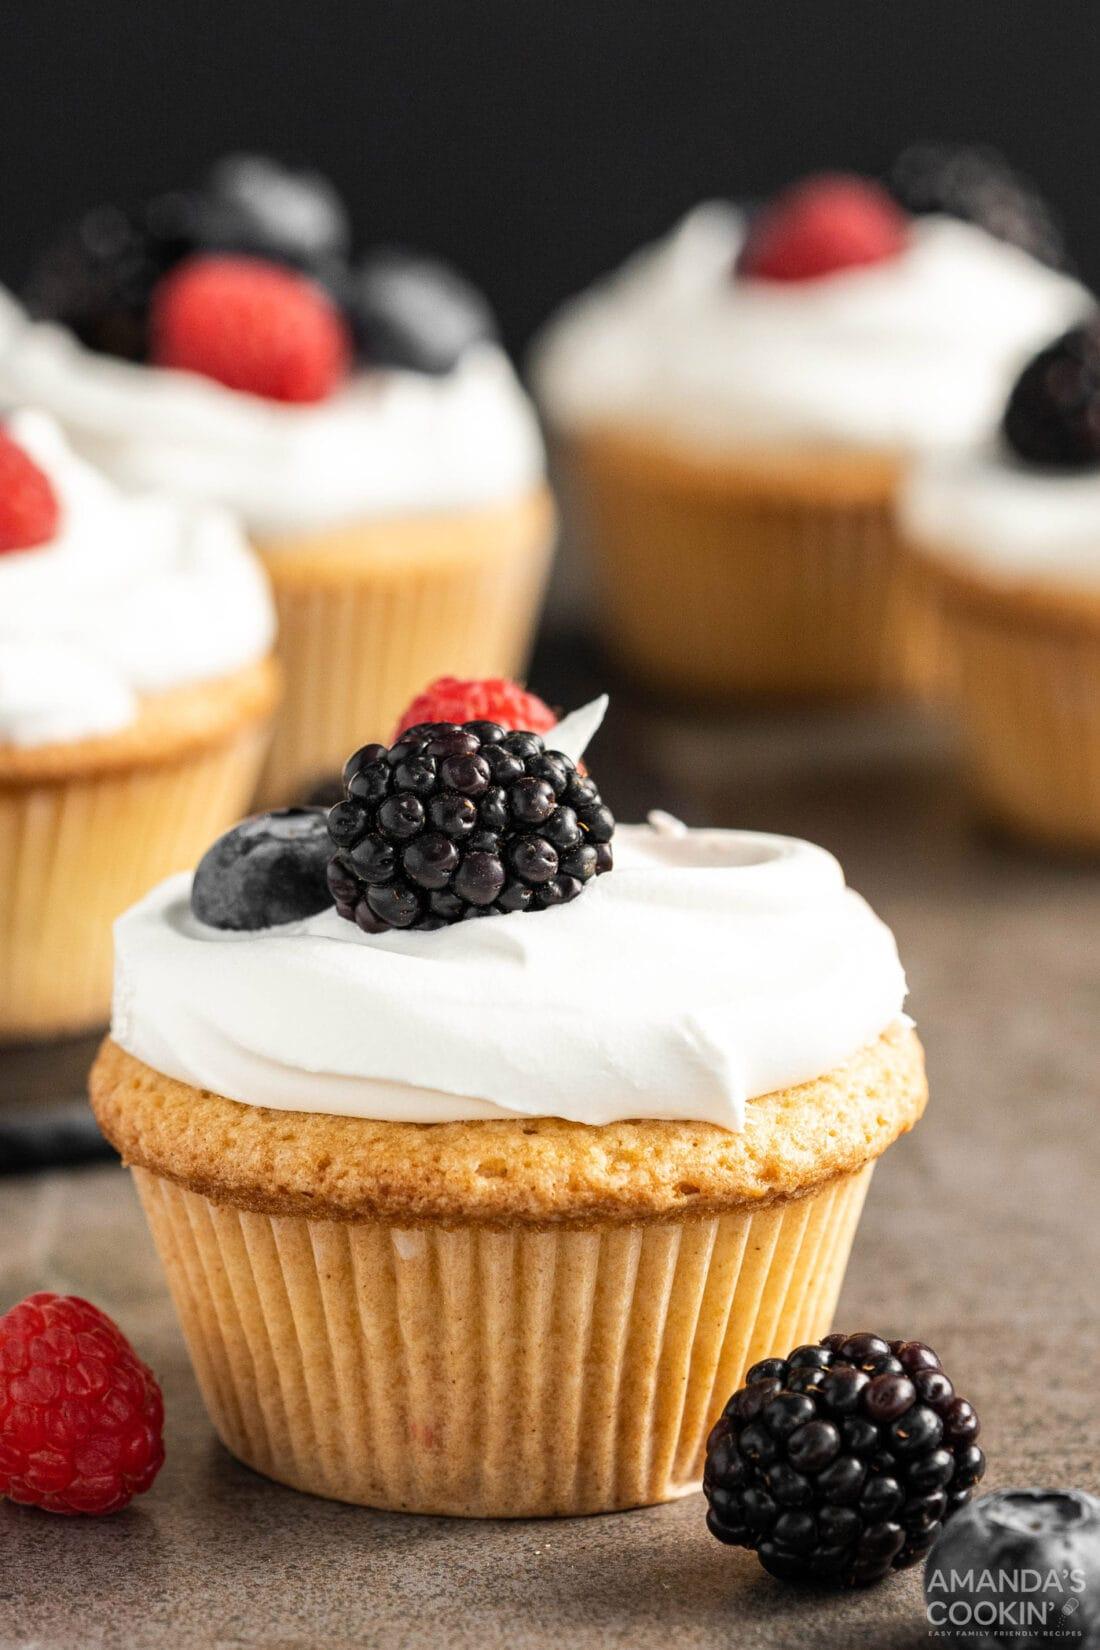 Pound Cake Cupcake with berry garnish